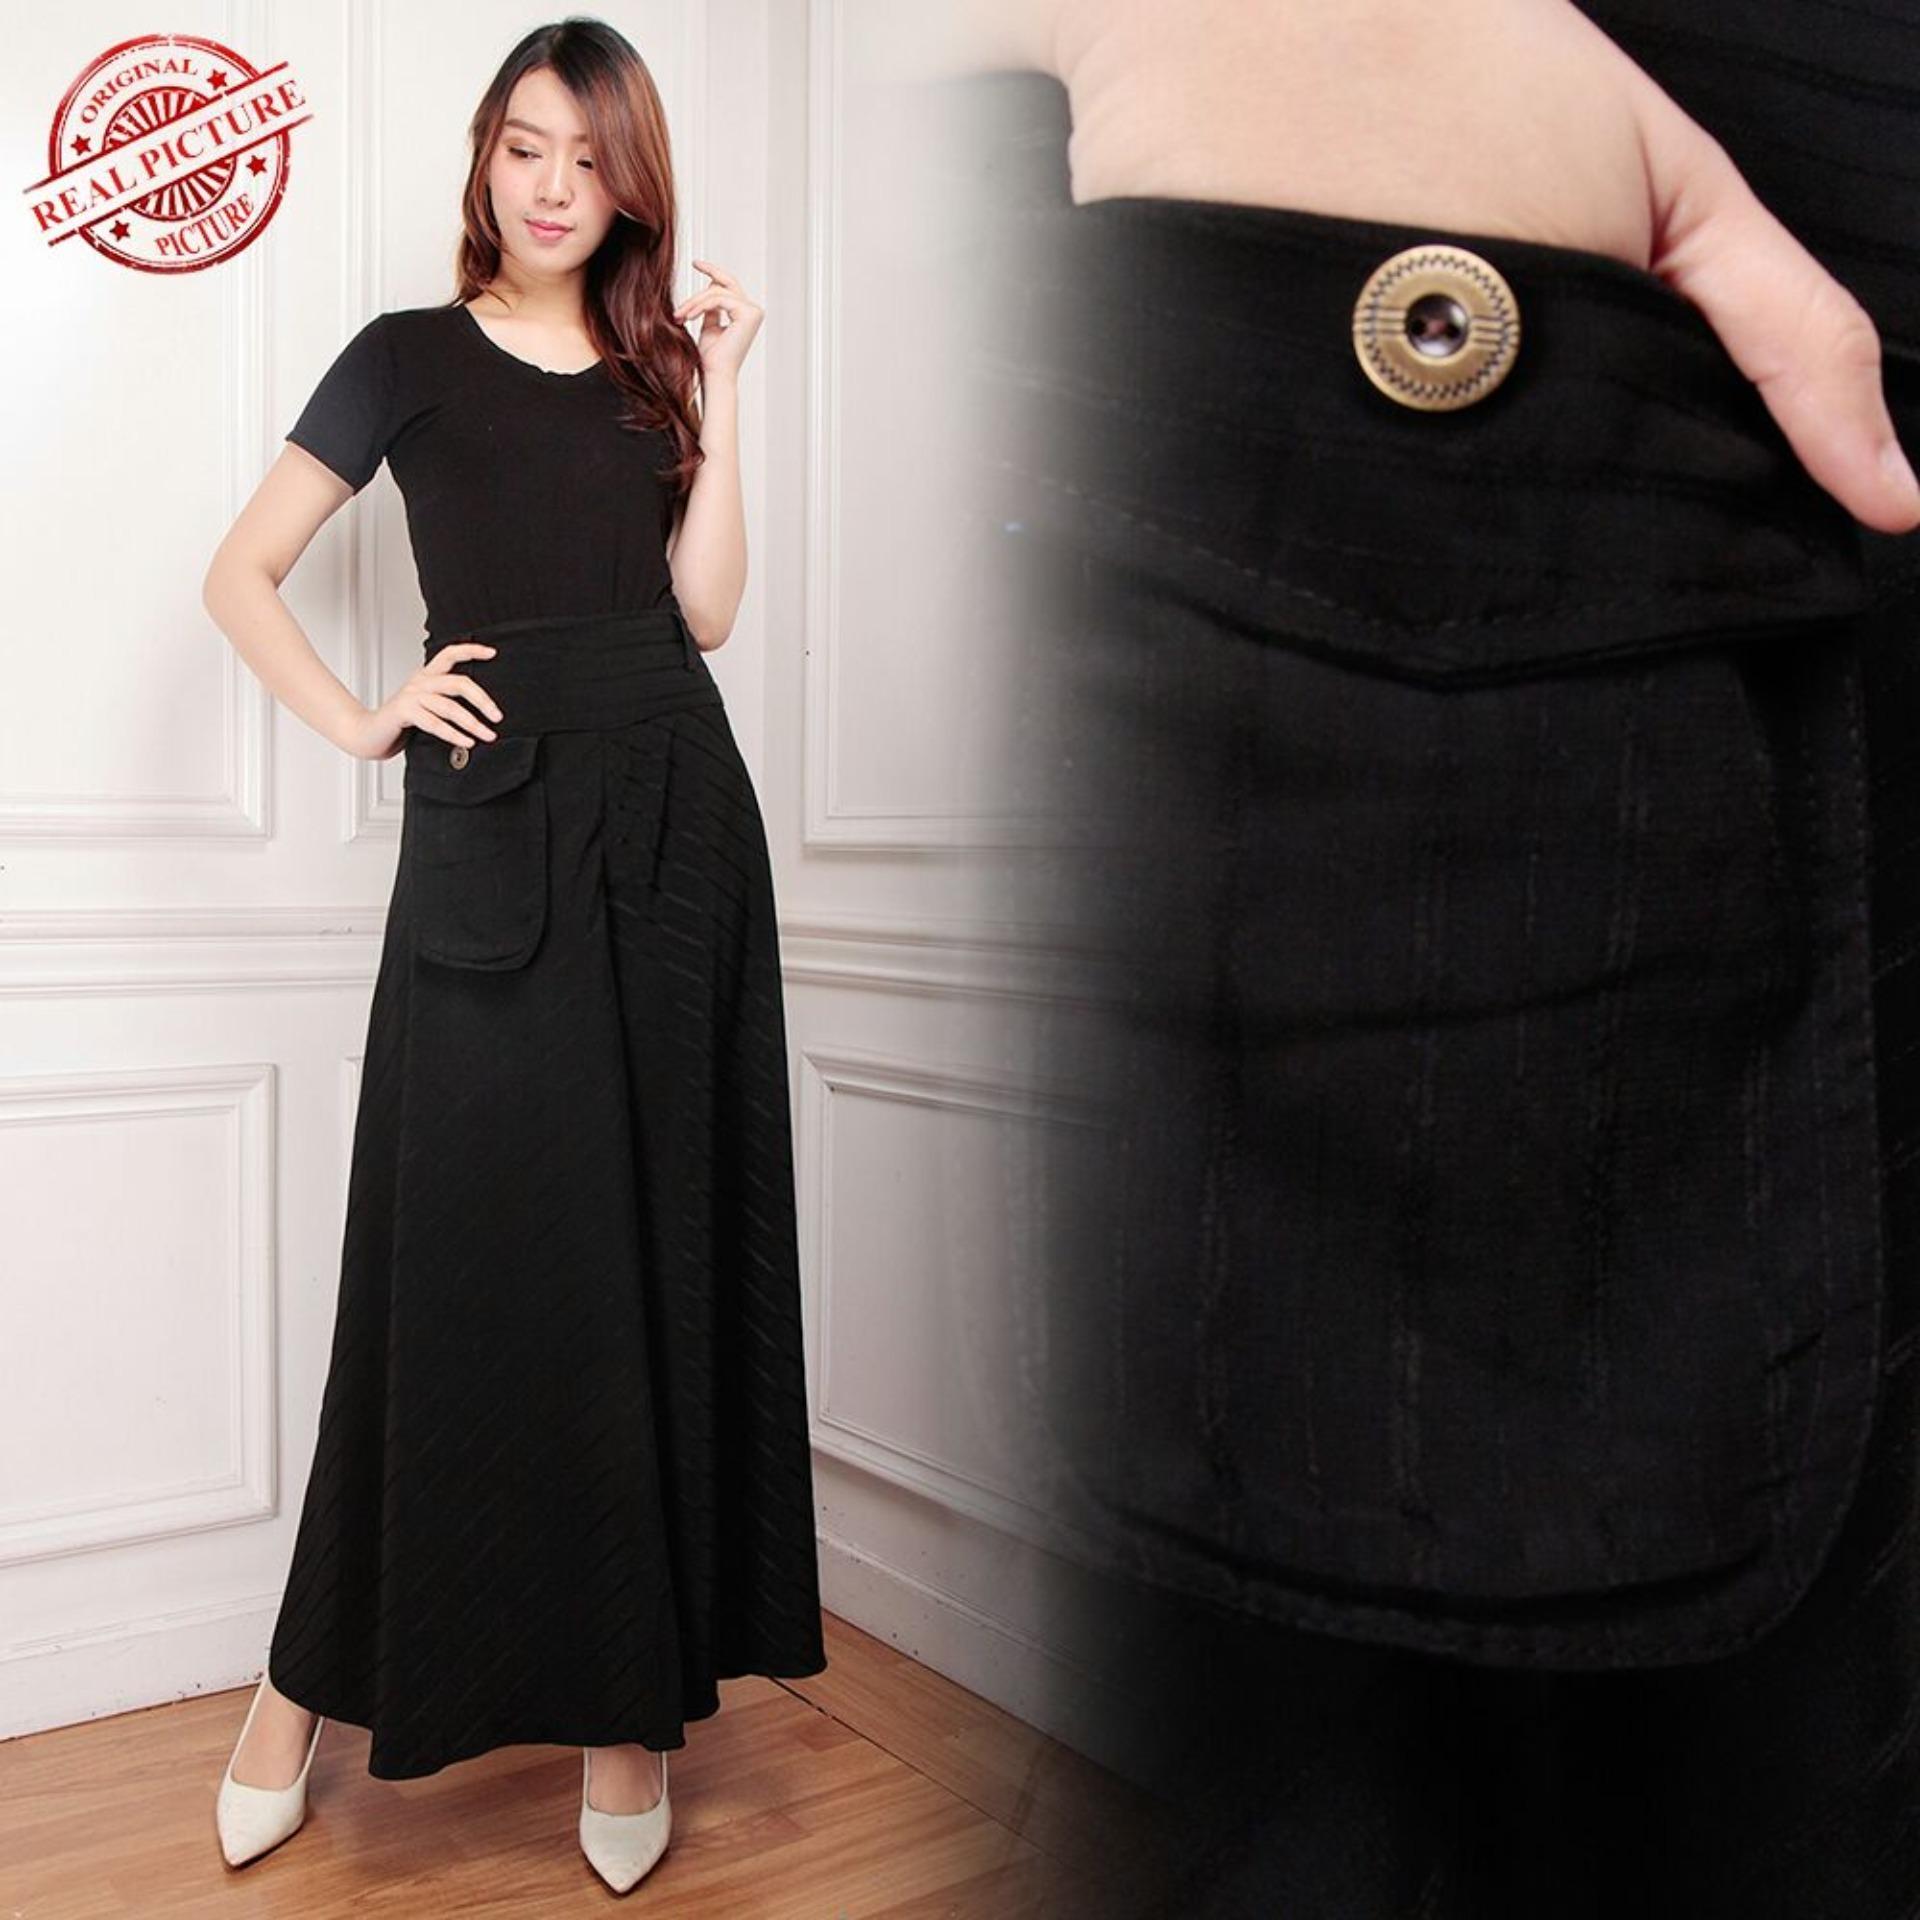 Toko Sb Collection Celana Panjang Belby Longpants Hitam Putih Wanita Di Banten